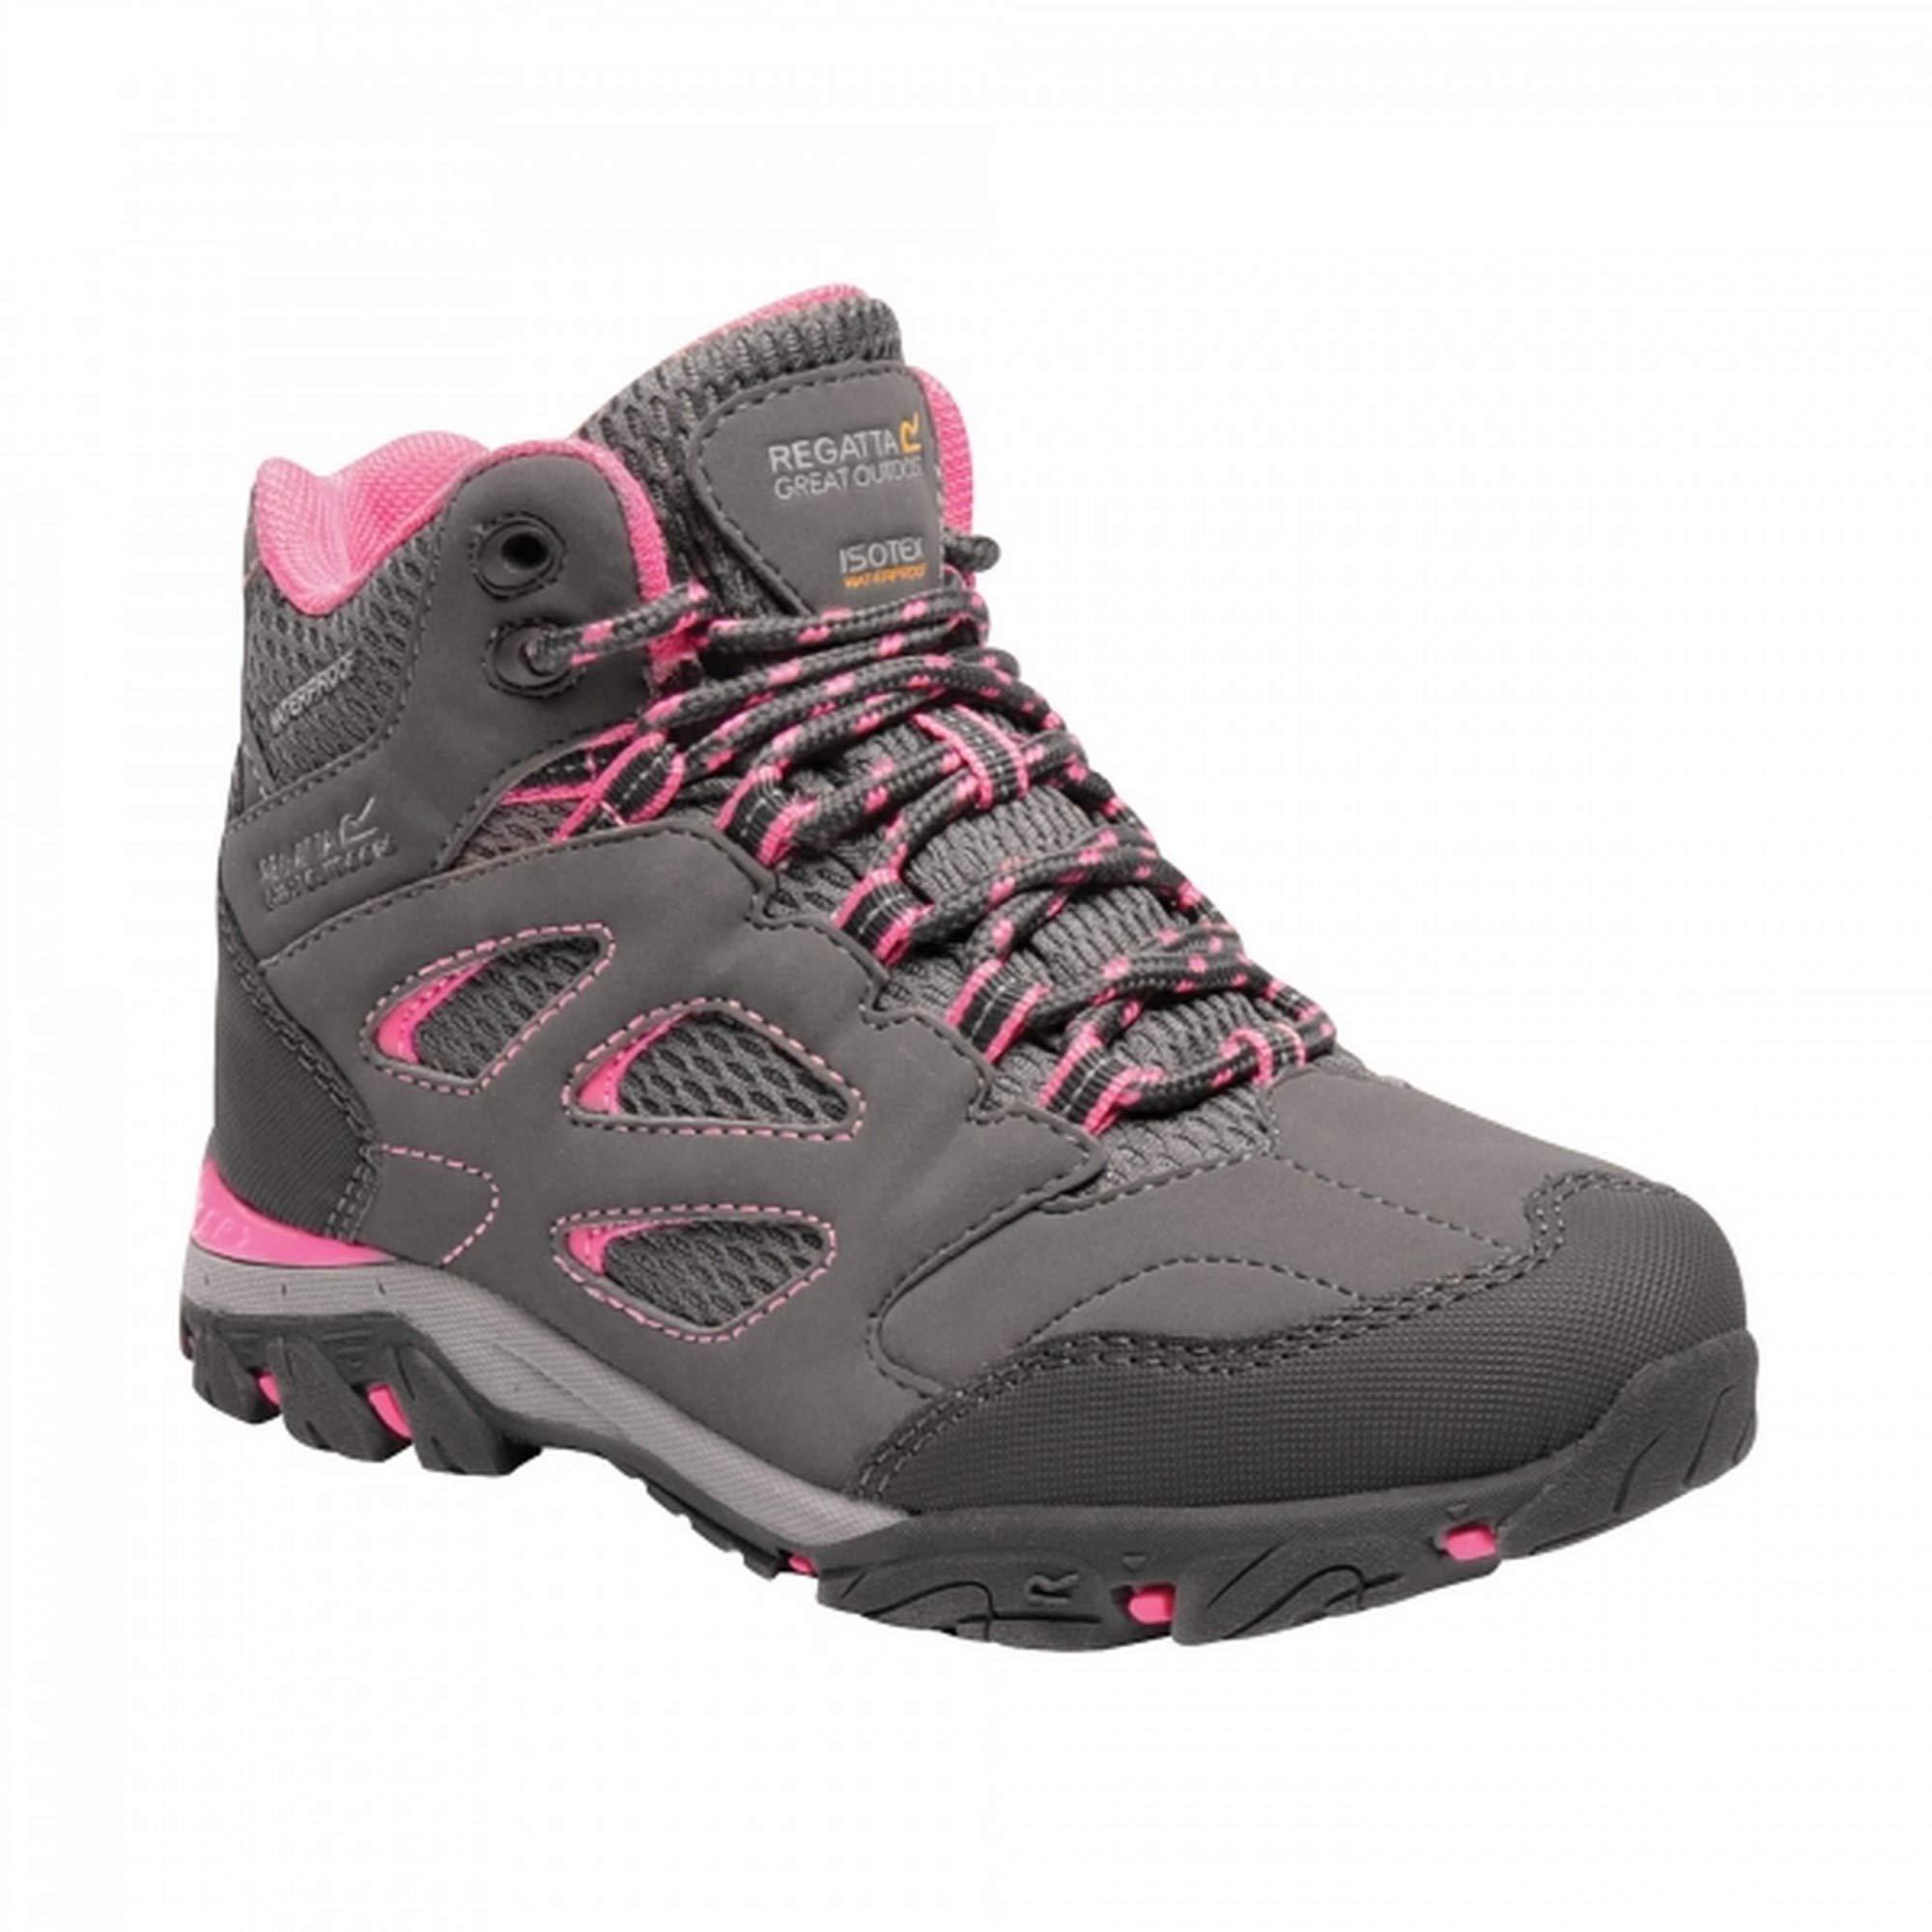 Regatta Childrens/Kids Holcombe IEP Junior Hiking Boots (10 M US Toddler) (Steel/Tulip)